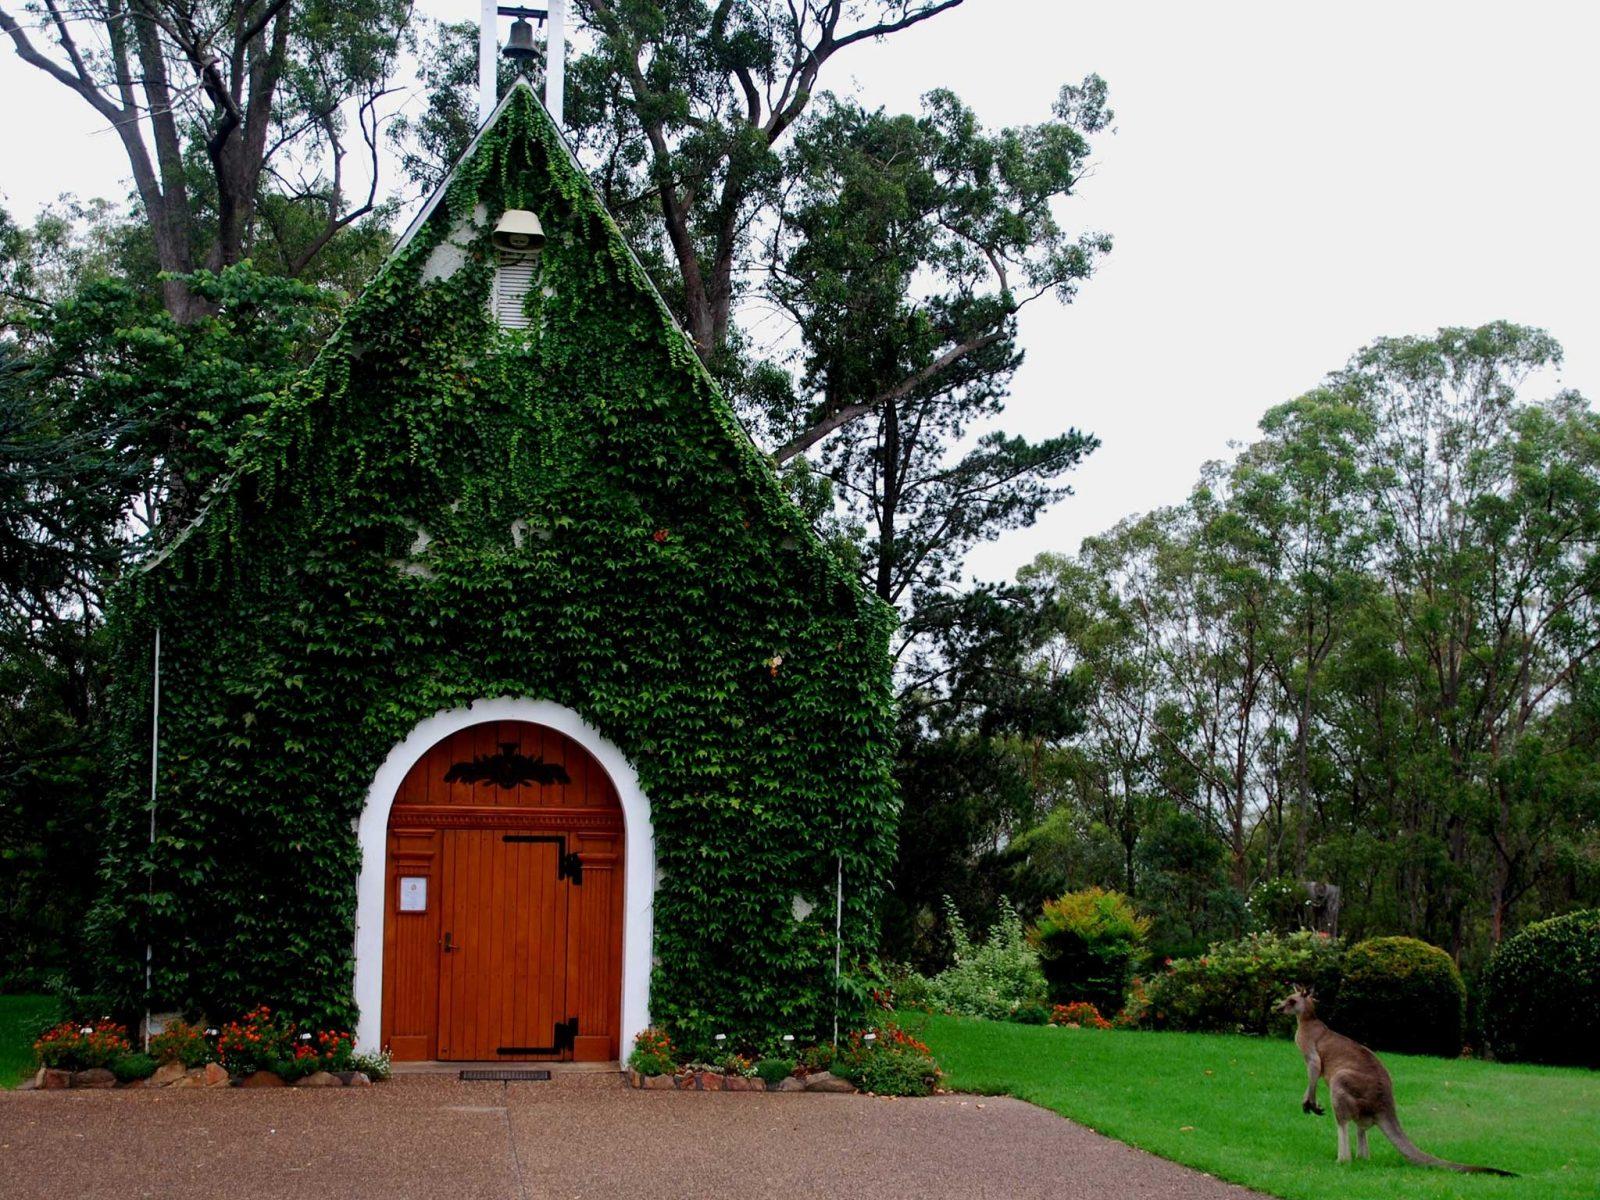 Kangaroo next to Shrine